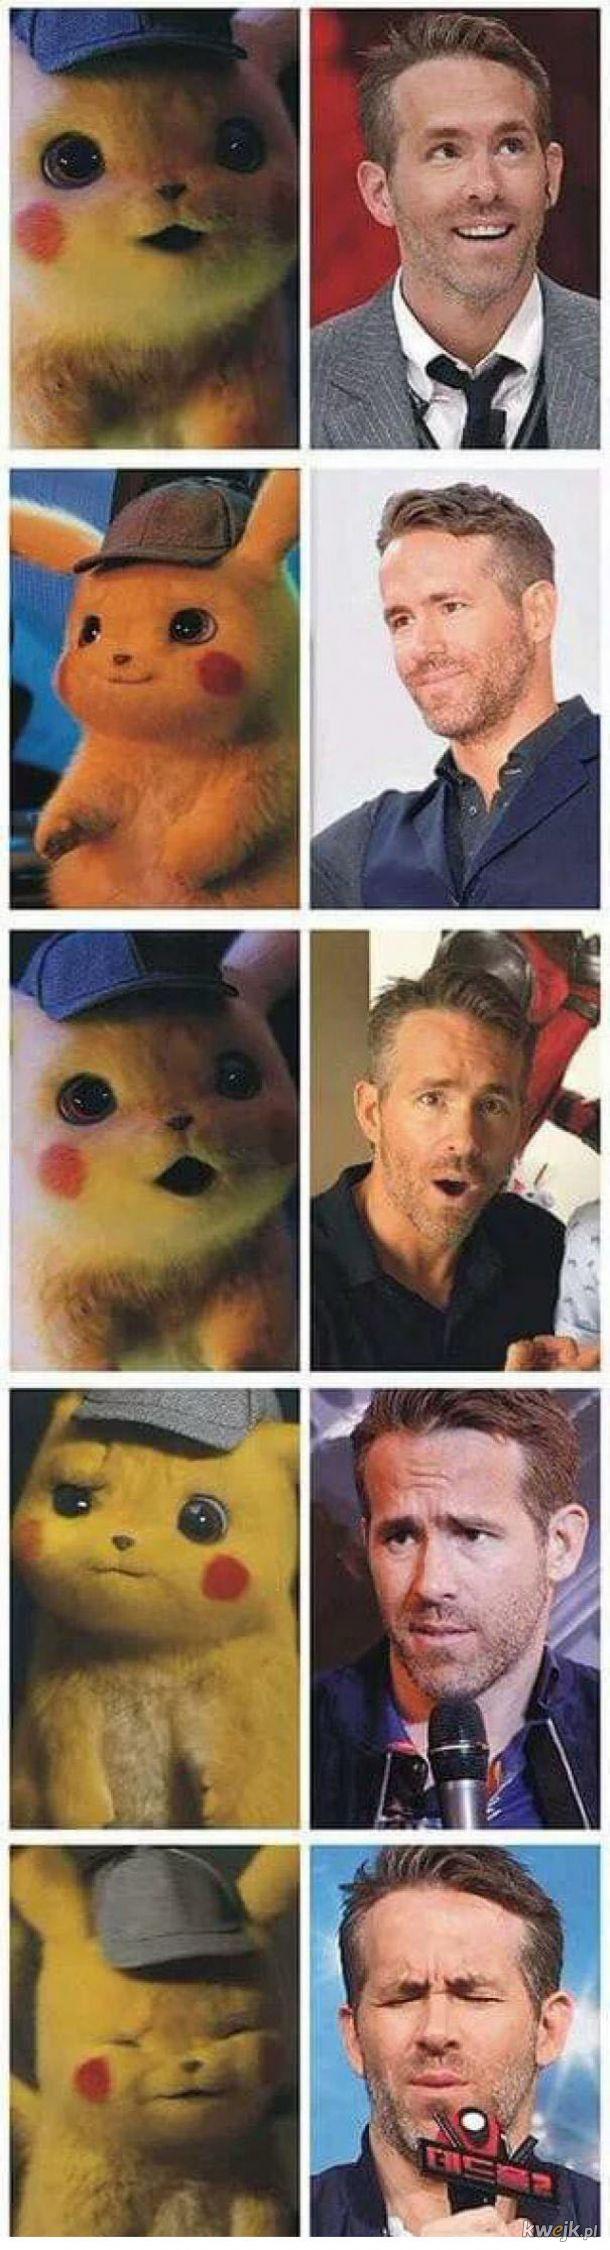 Pikachu to Ryan Reynolds